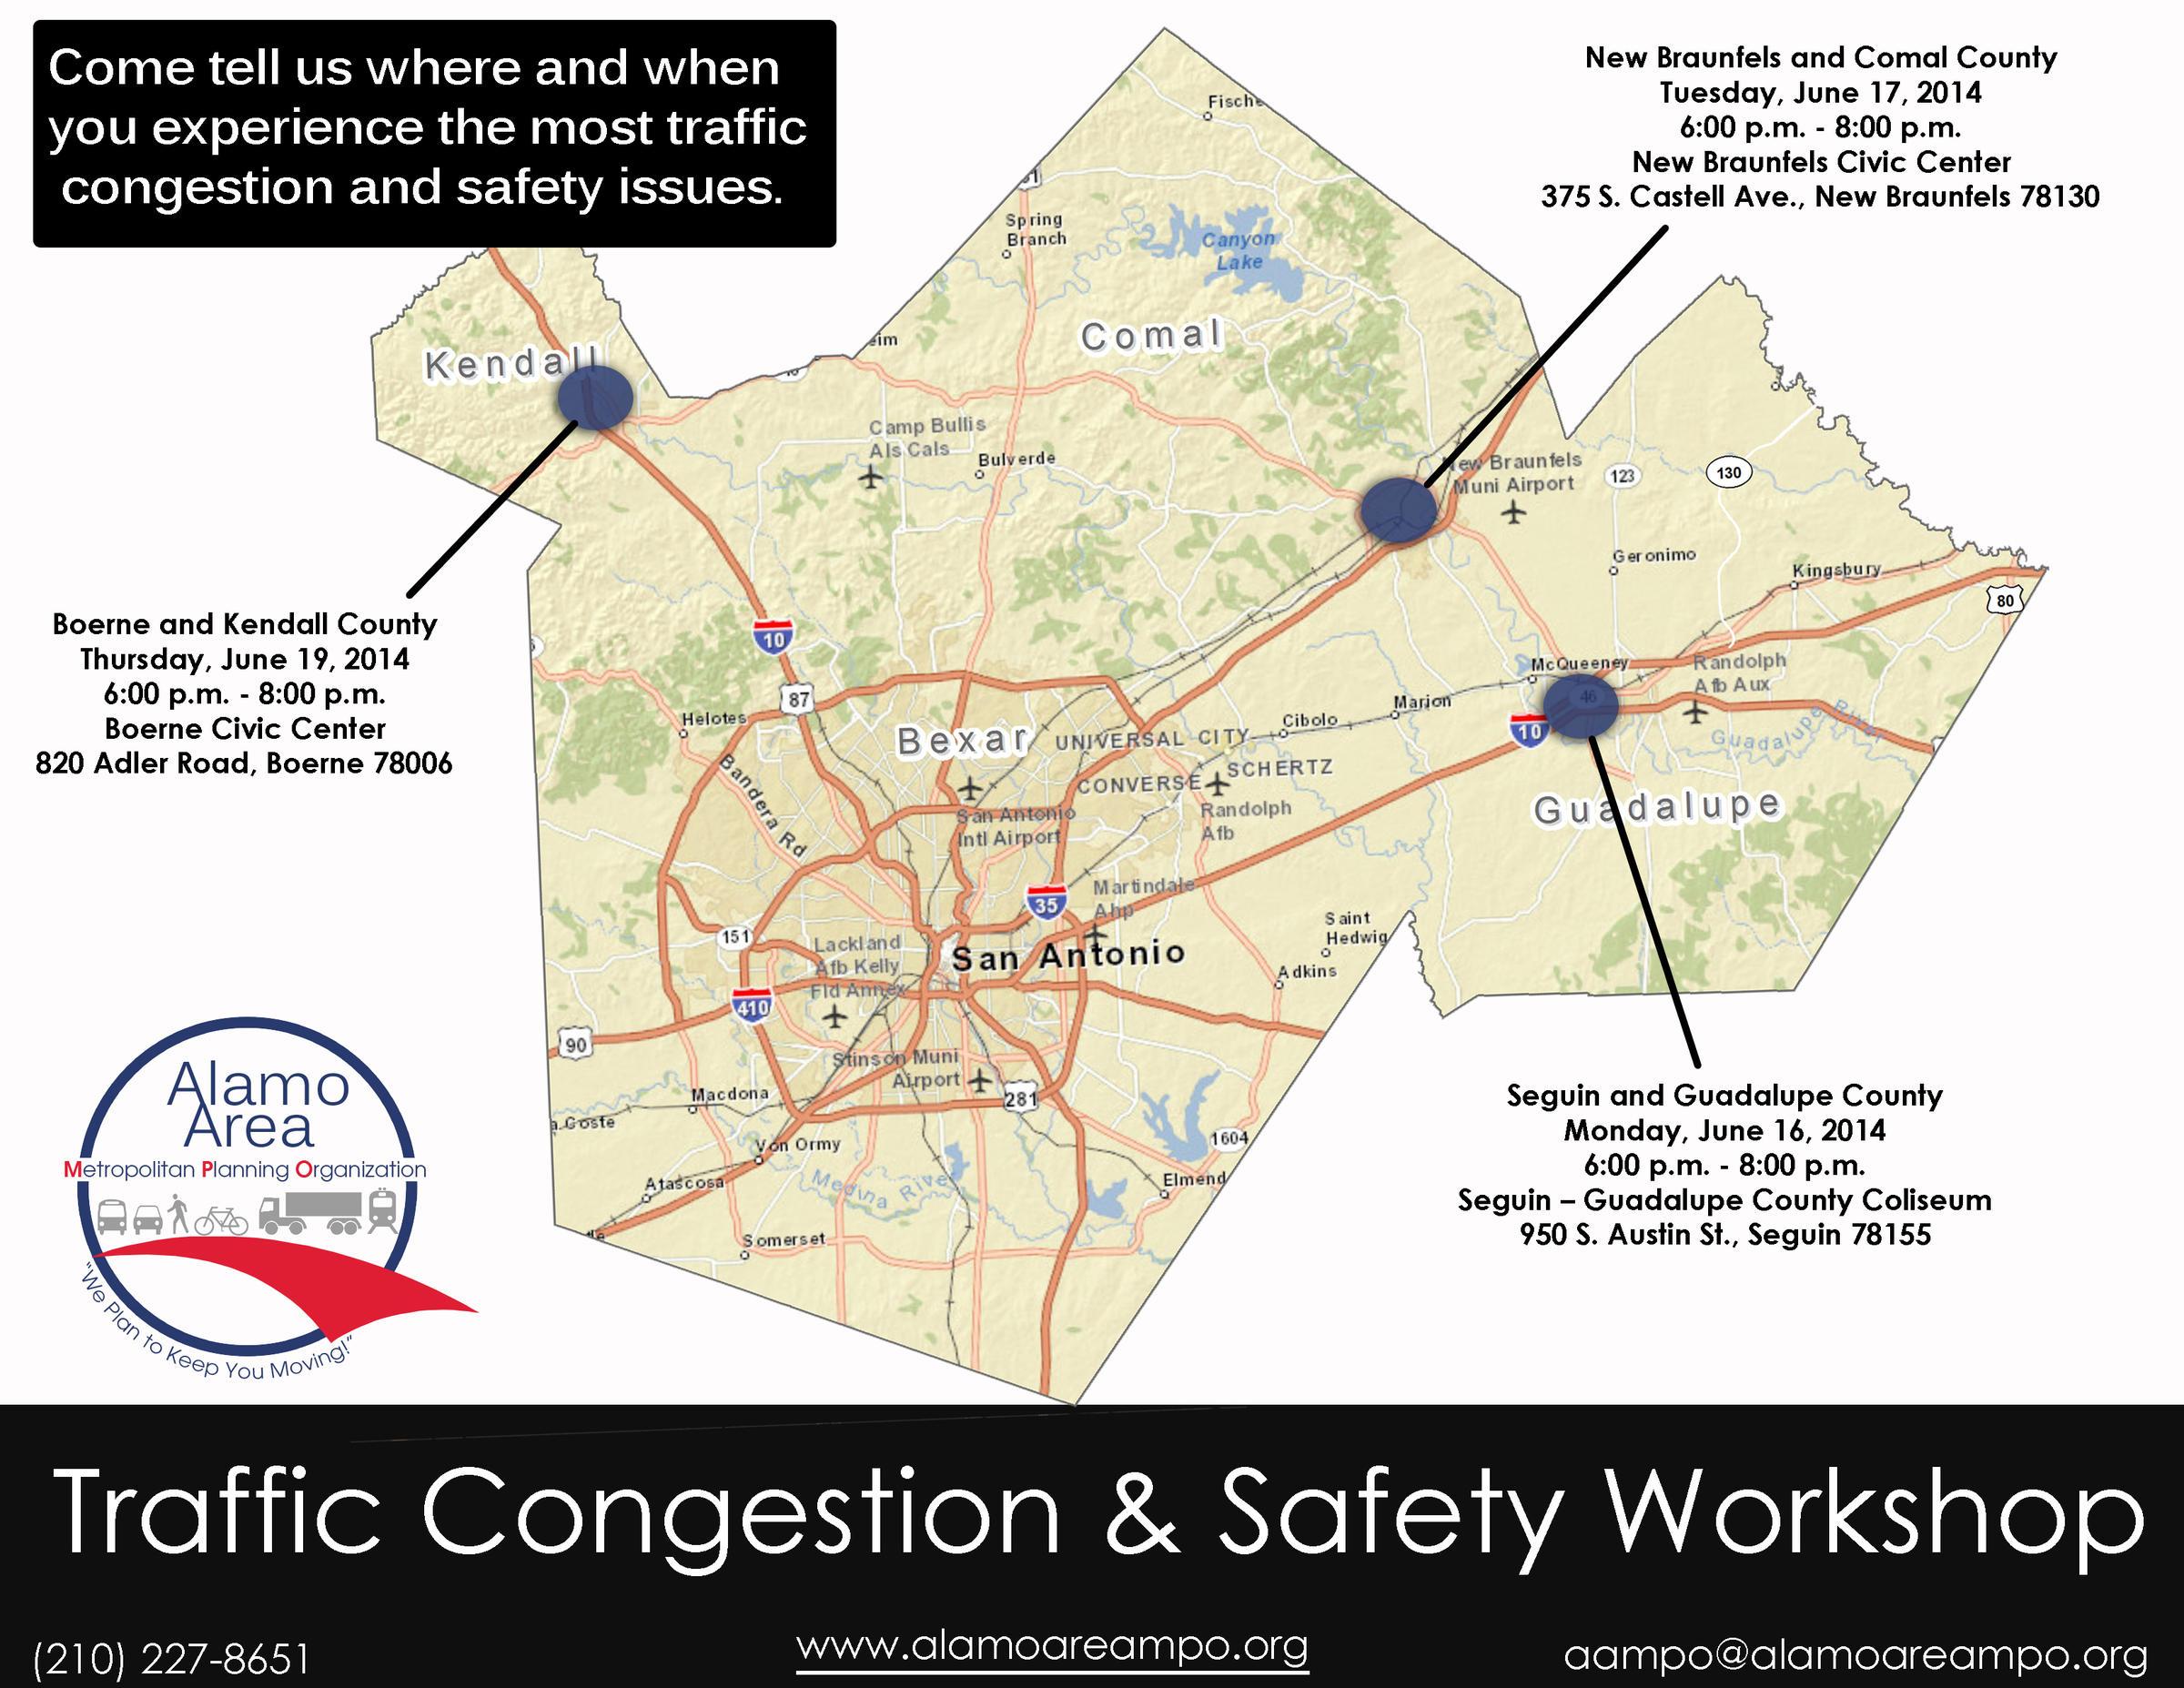 Alamo Area MPO Gathering Traffic Input From Boerne New Braunfels